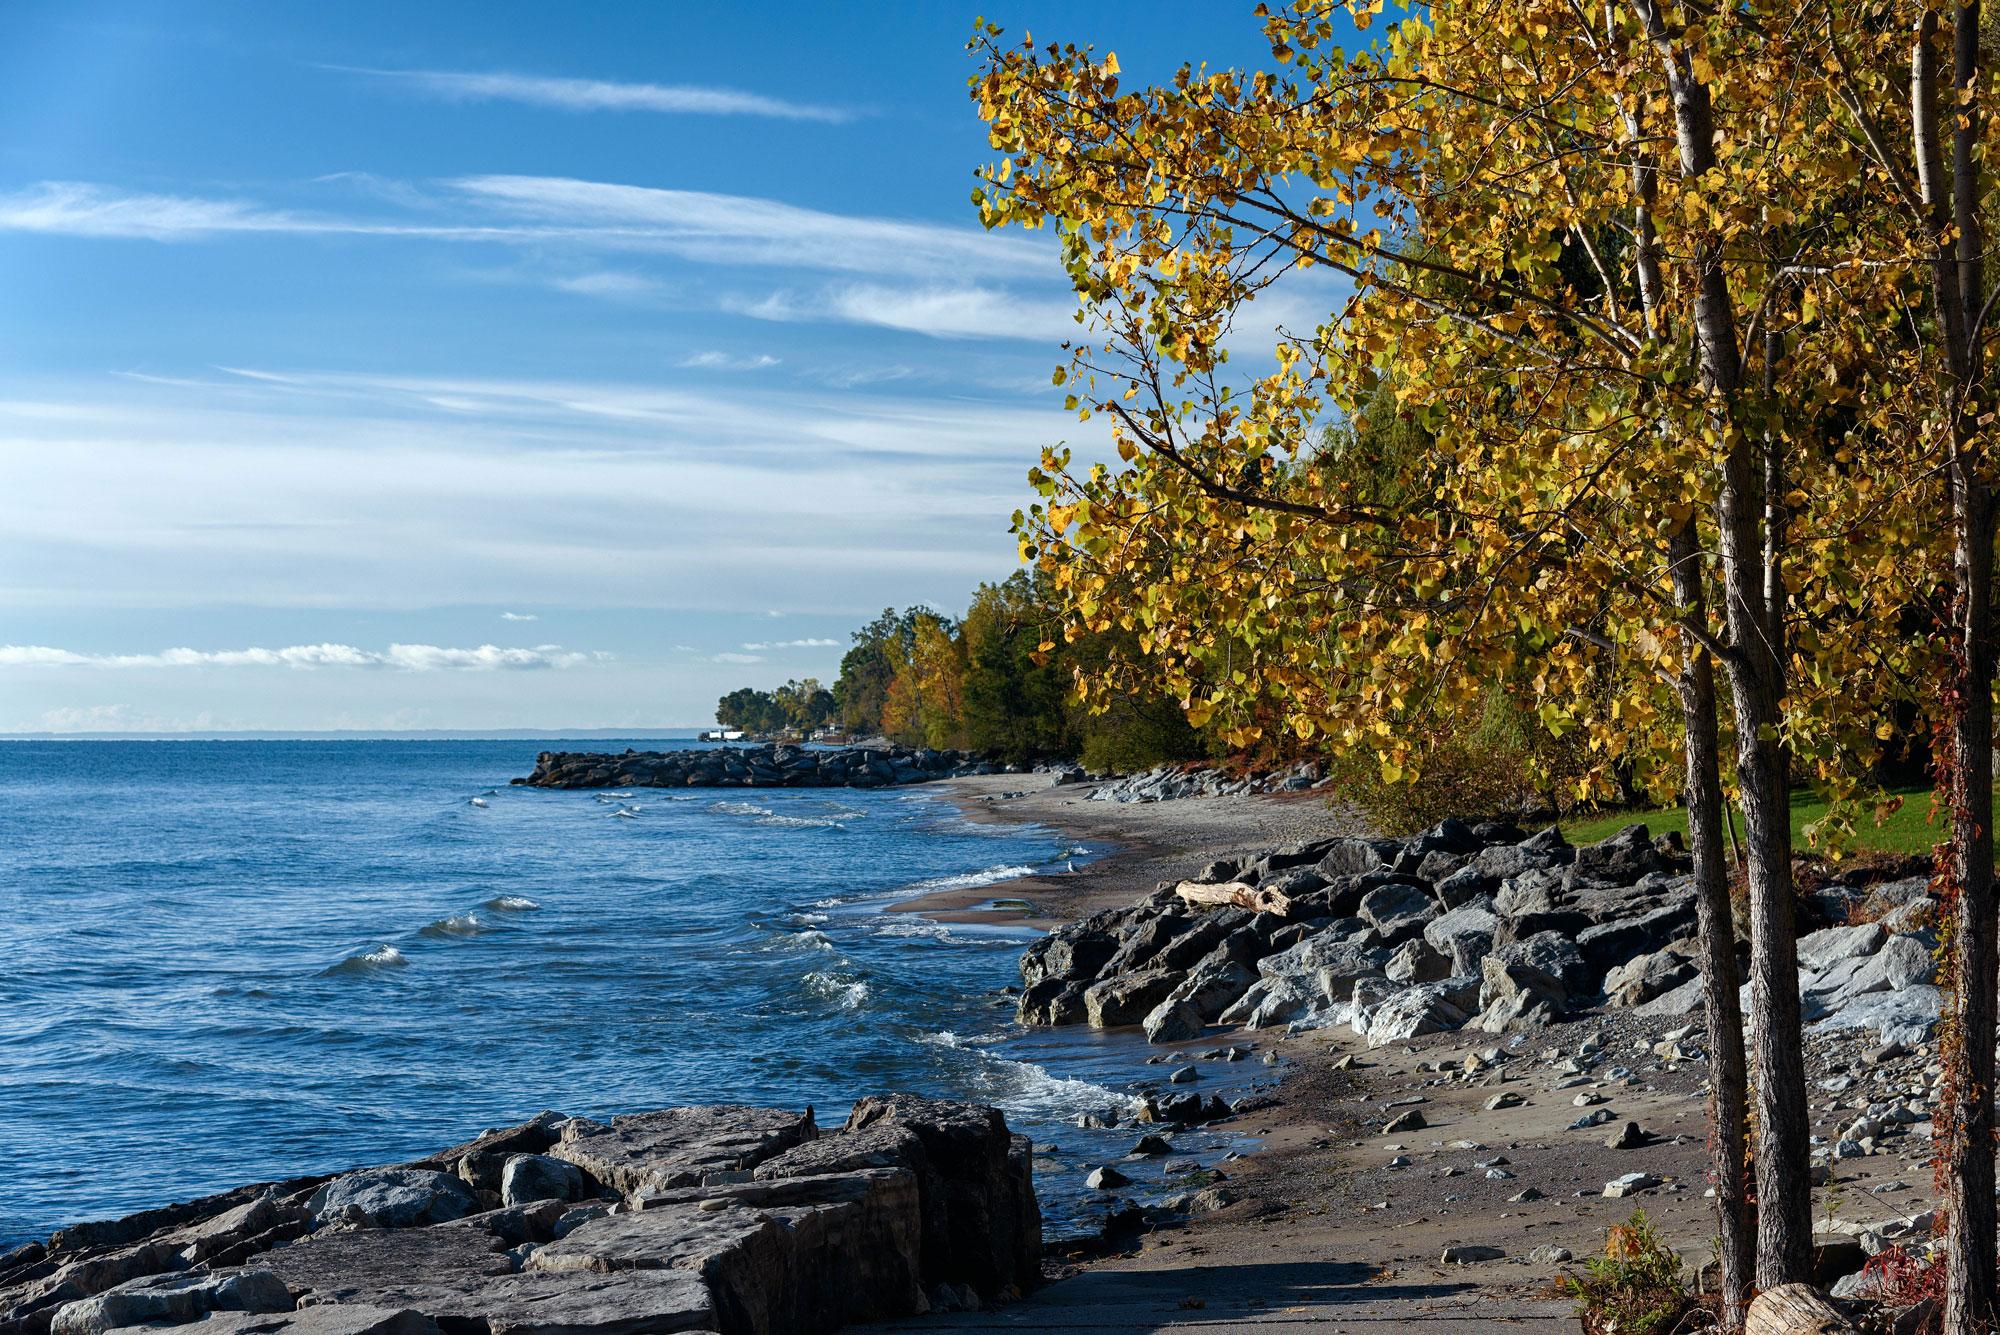 Lake Ontario shoreline at Jack Darling park in Mississauga, Ontario. (Photo via  Joe deSousa )